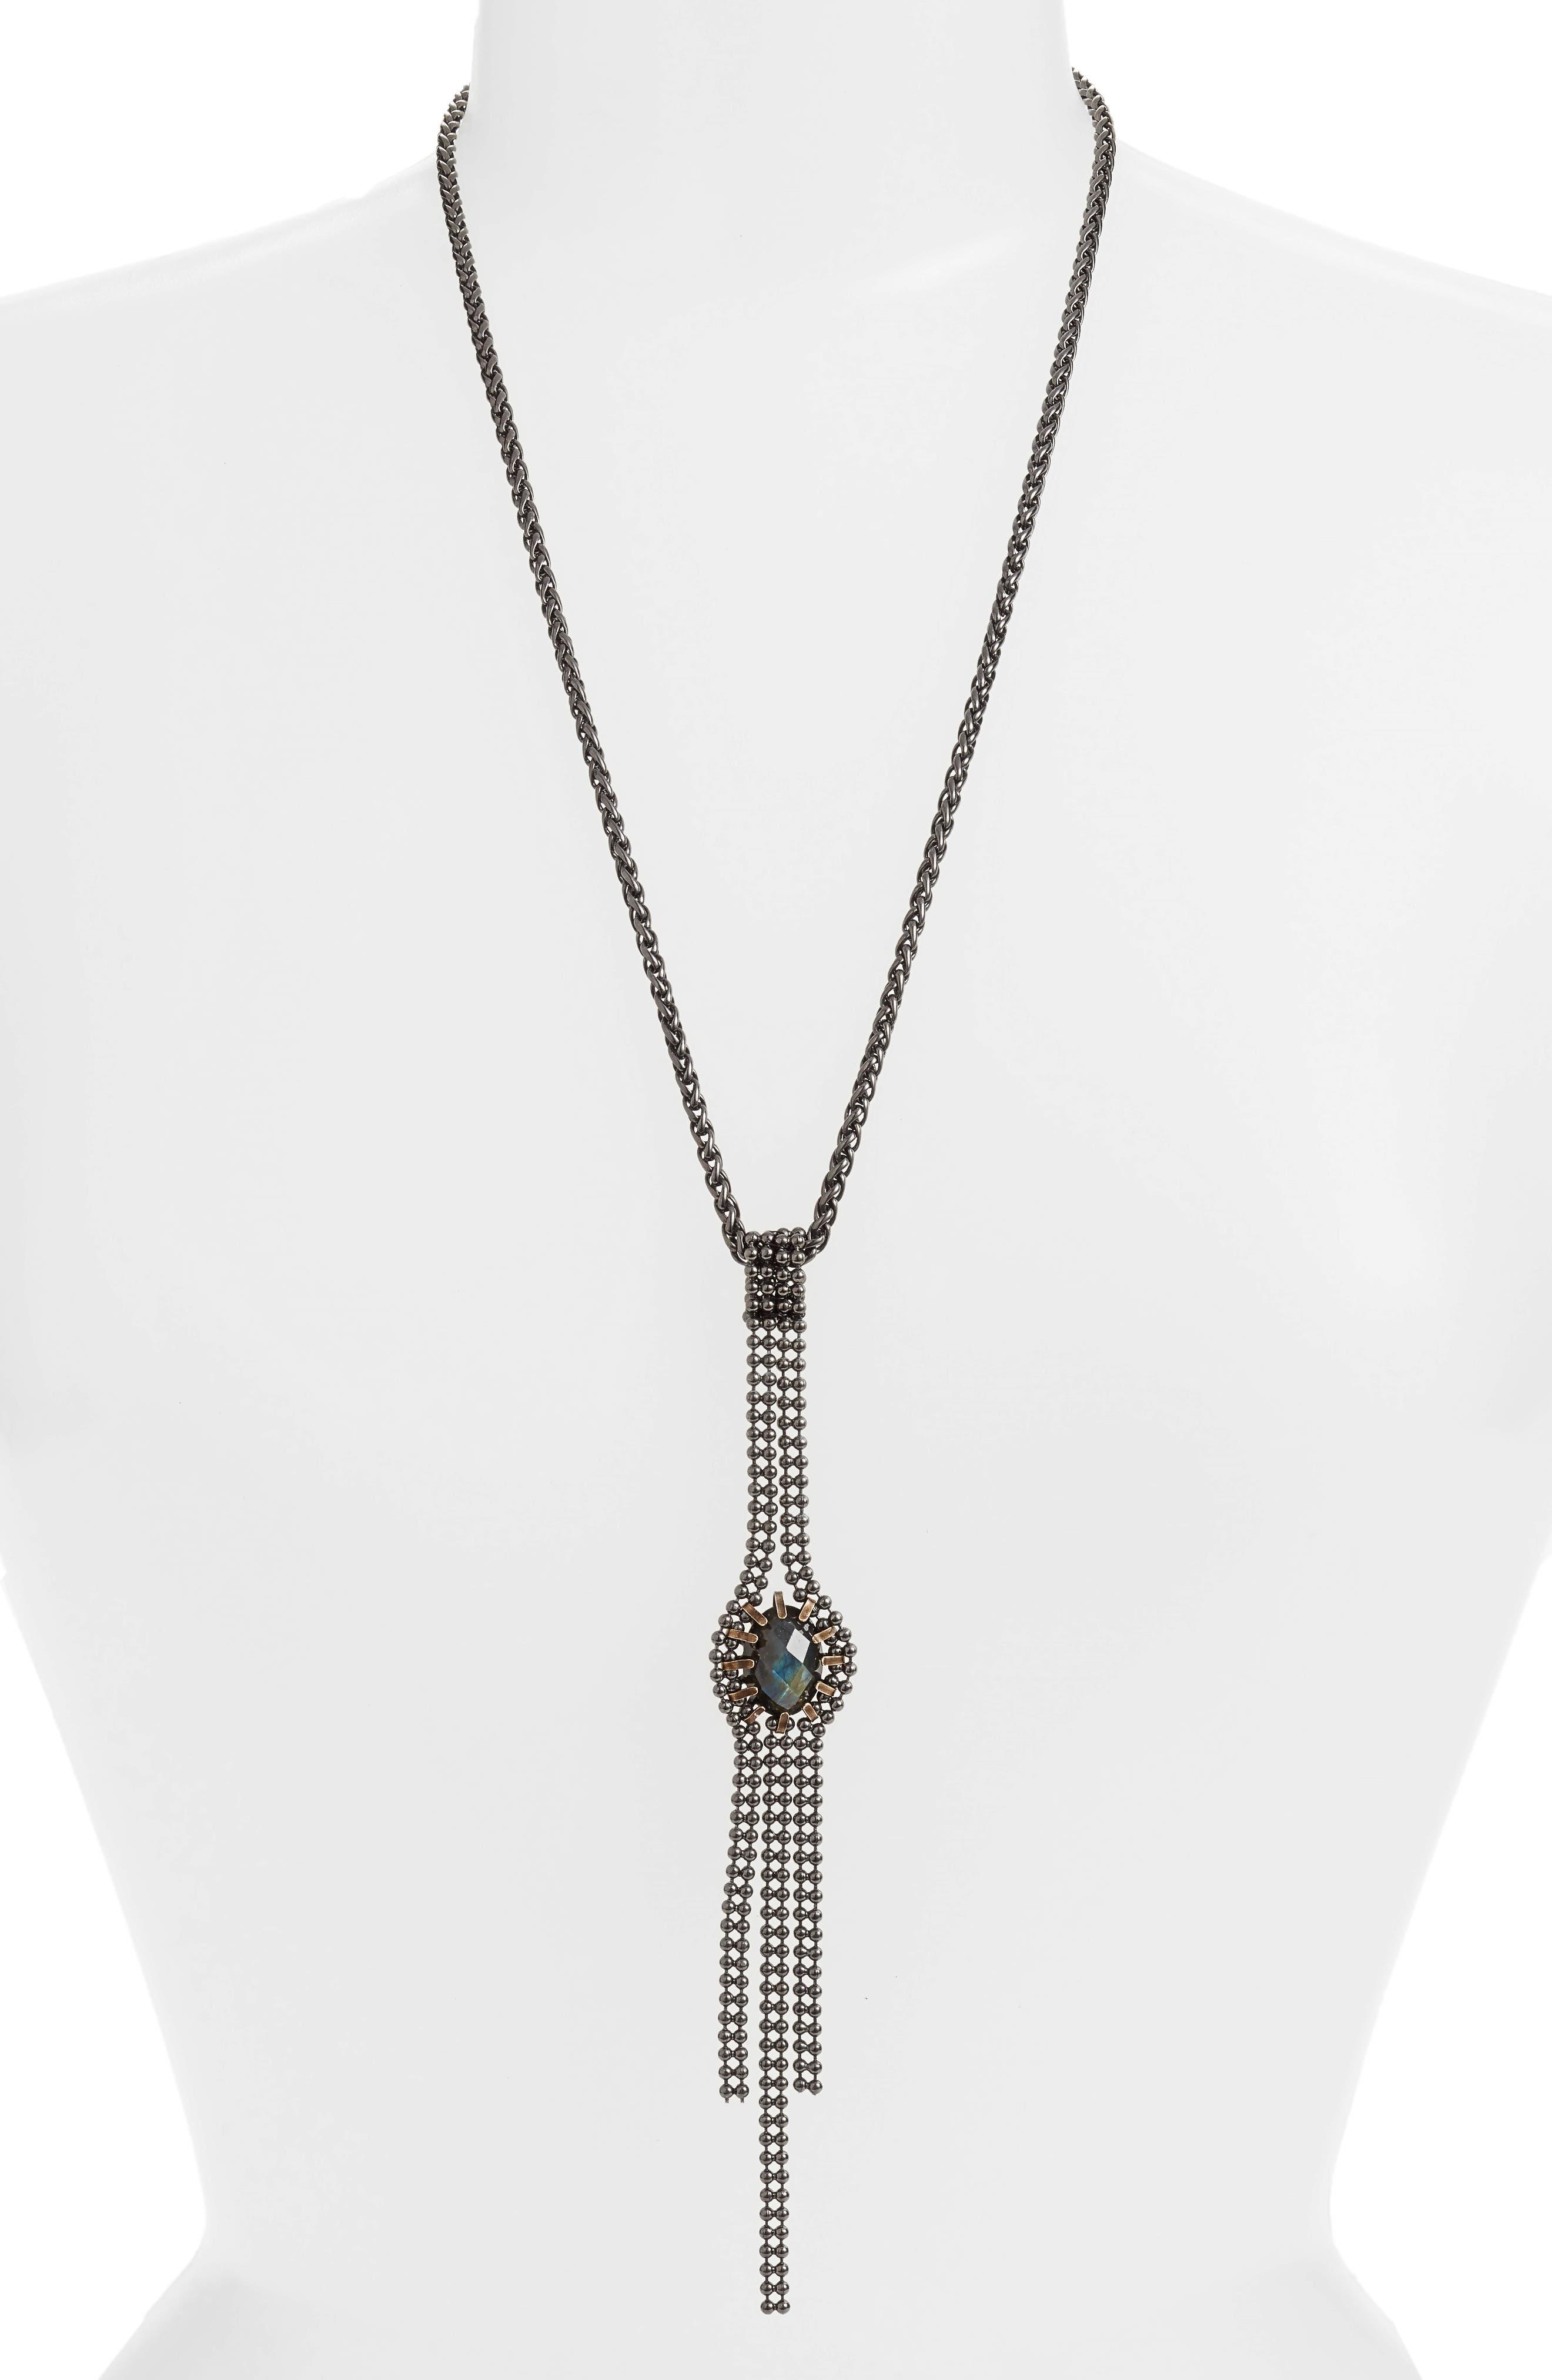 Main Image - Cynthia Desser Labradorite Pendant Necklace